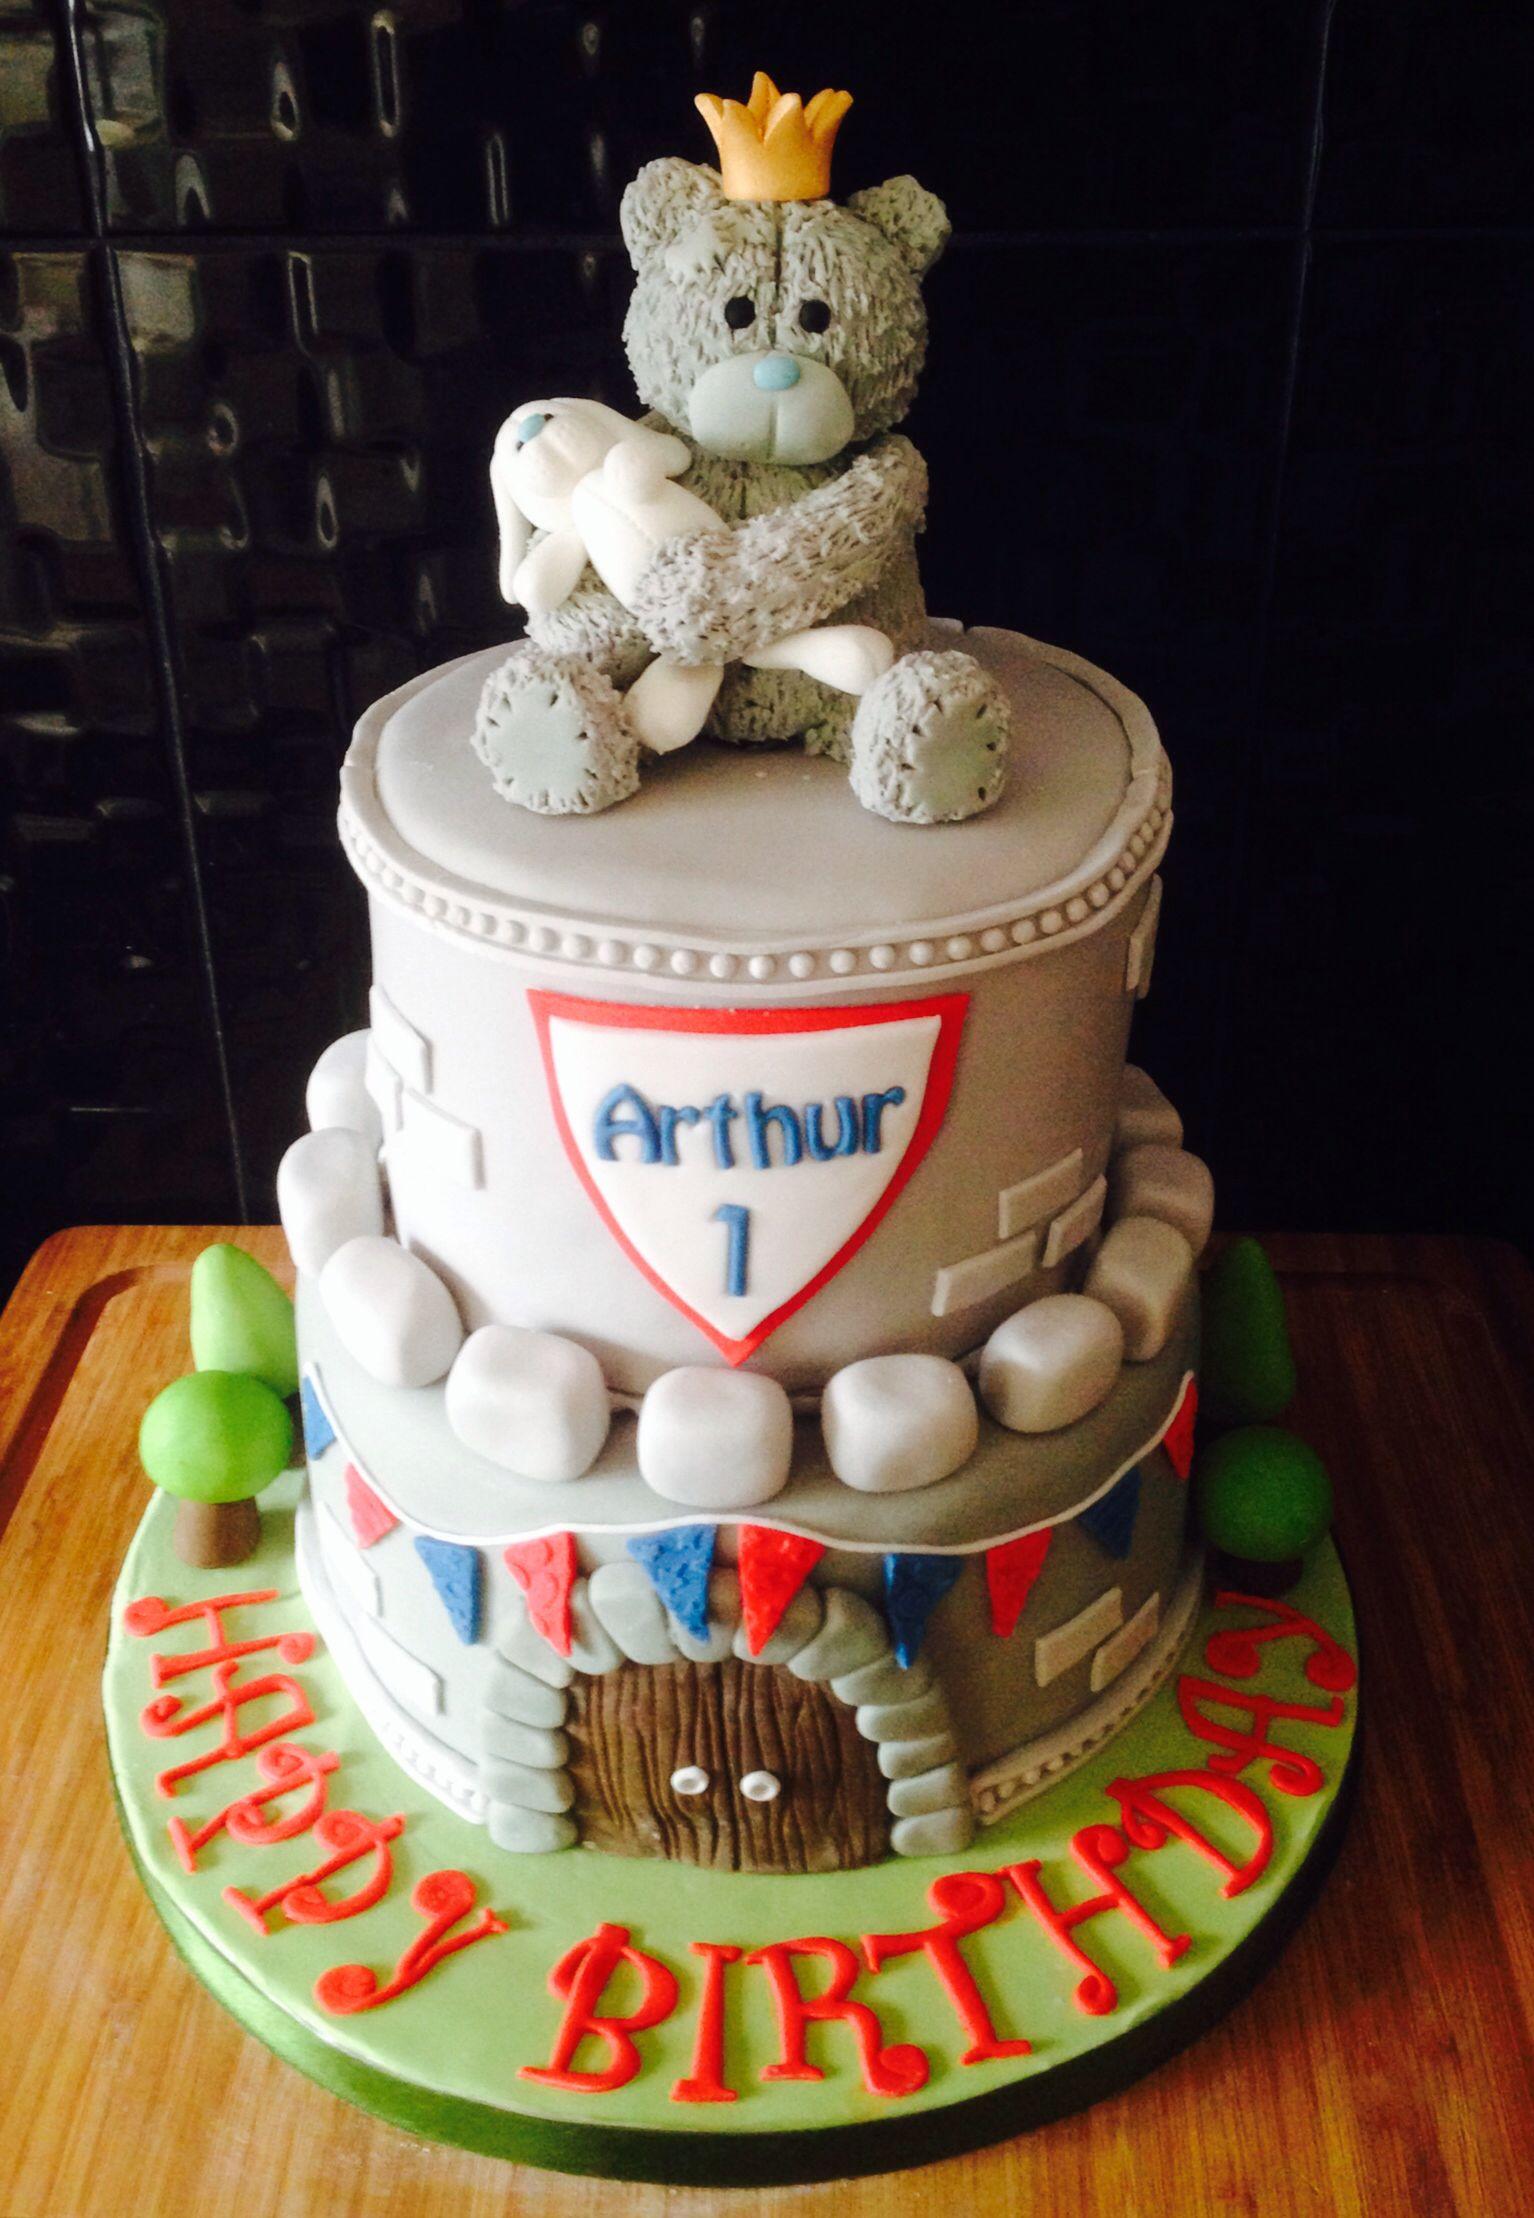 Arthurs first birthday cake x King Arthur themed My cakes Ive